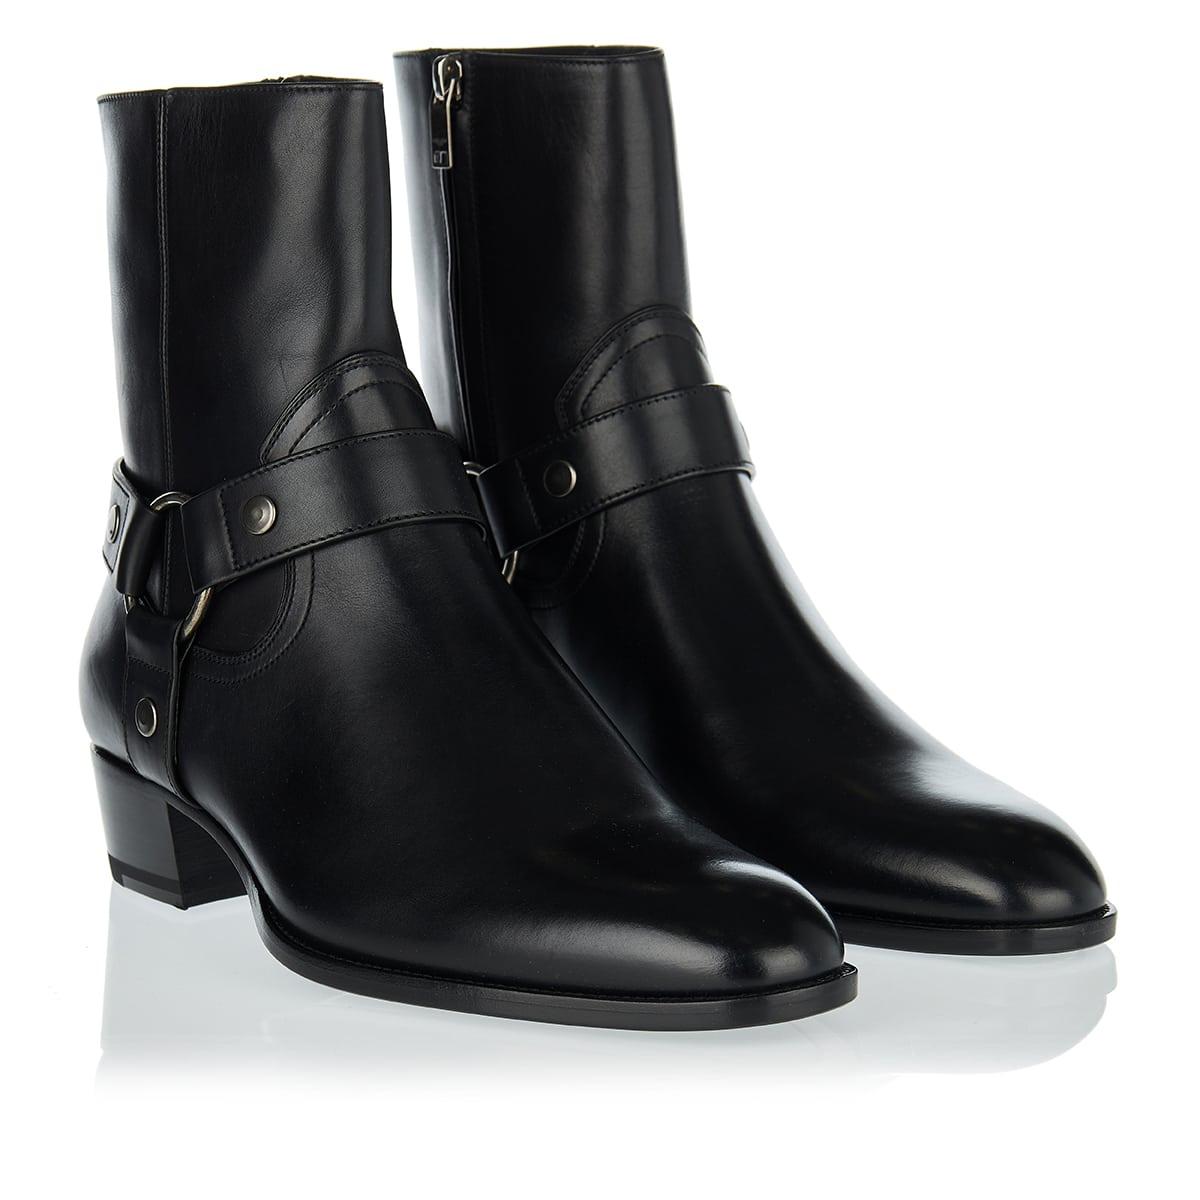 Wyatt harness leather boots